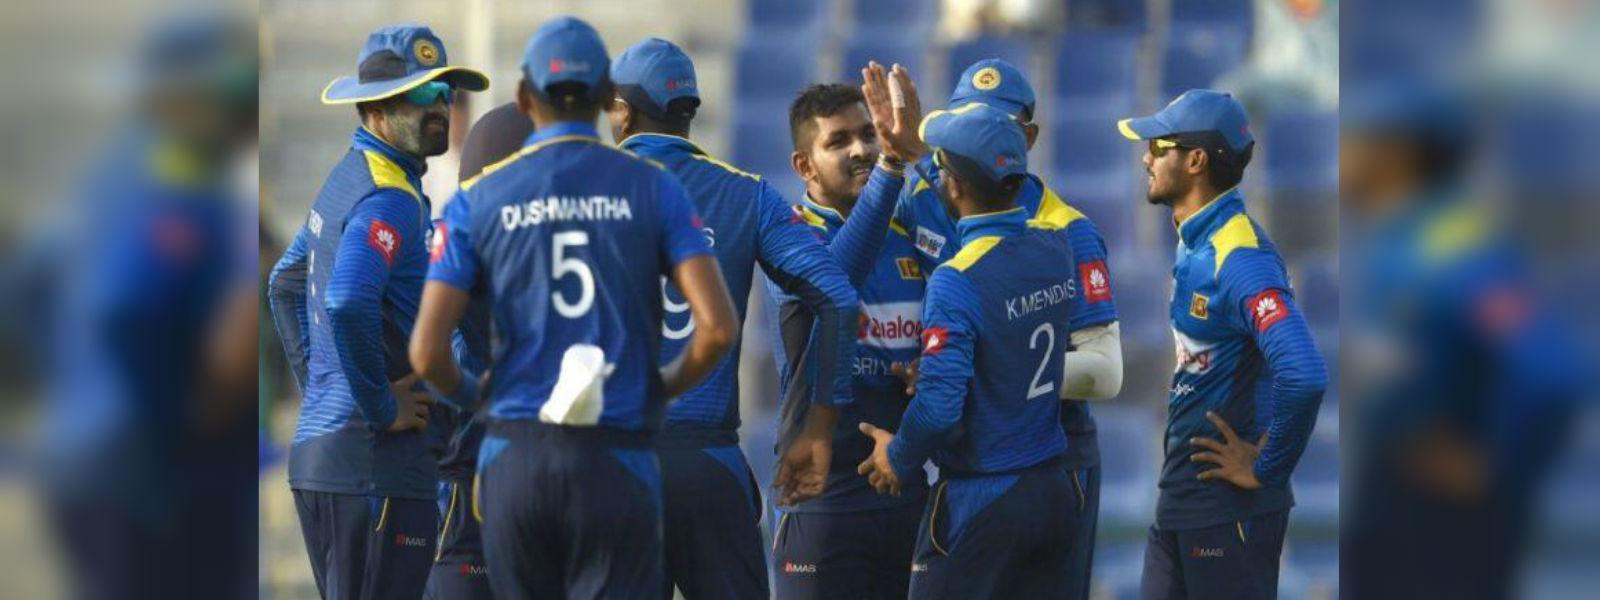 Captain leads Sri Lanka to a good win